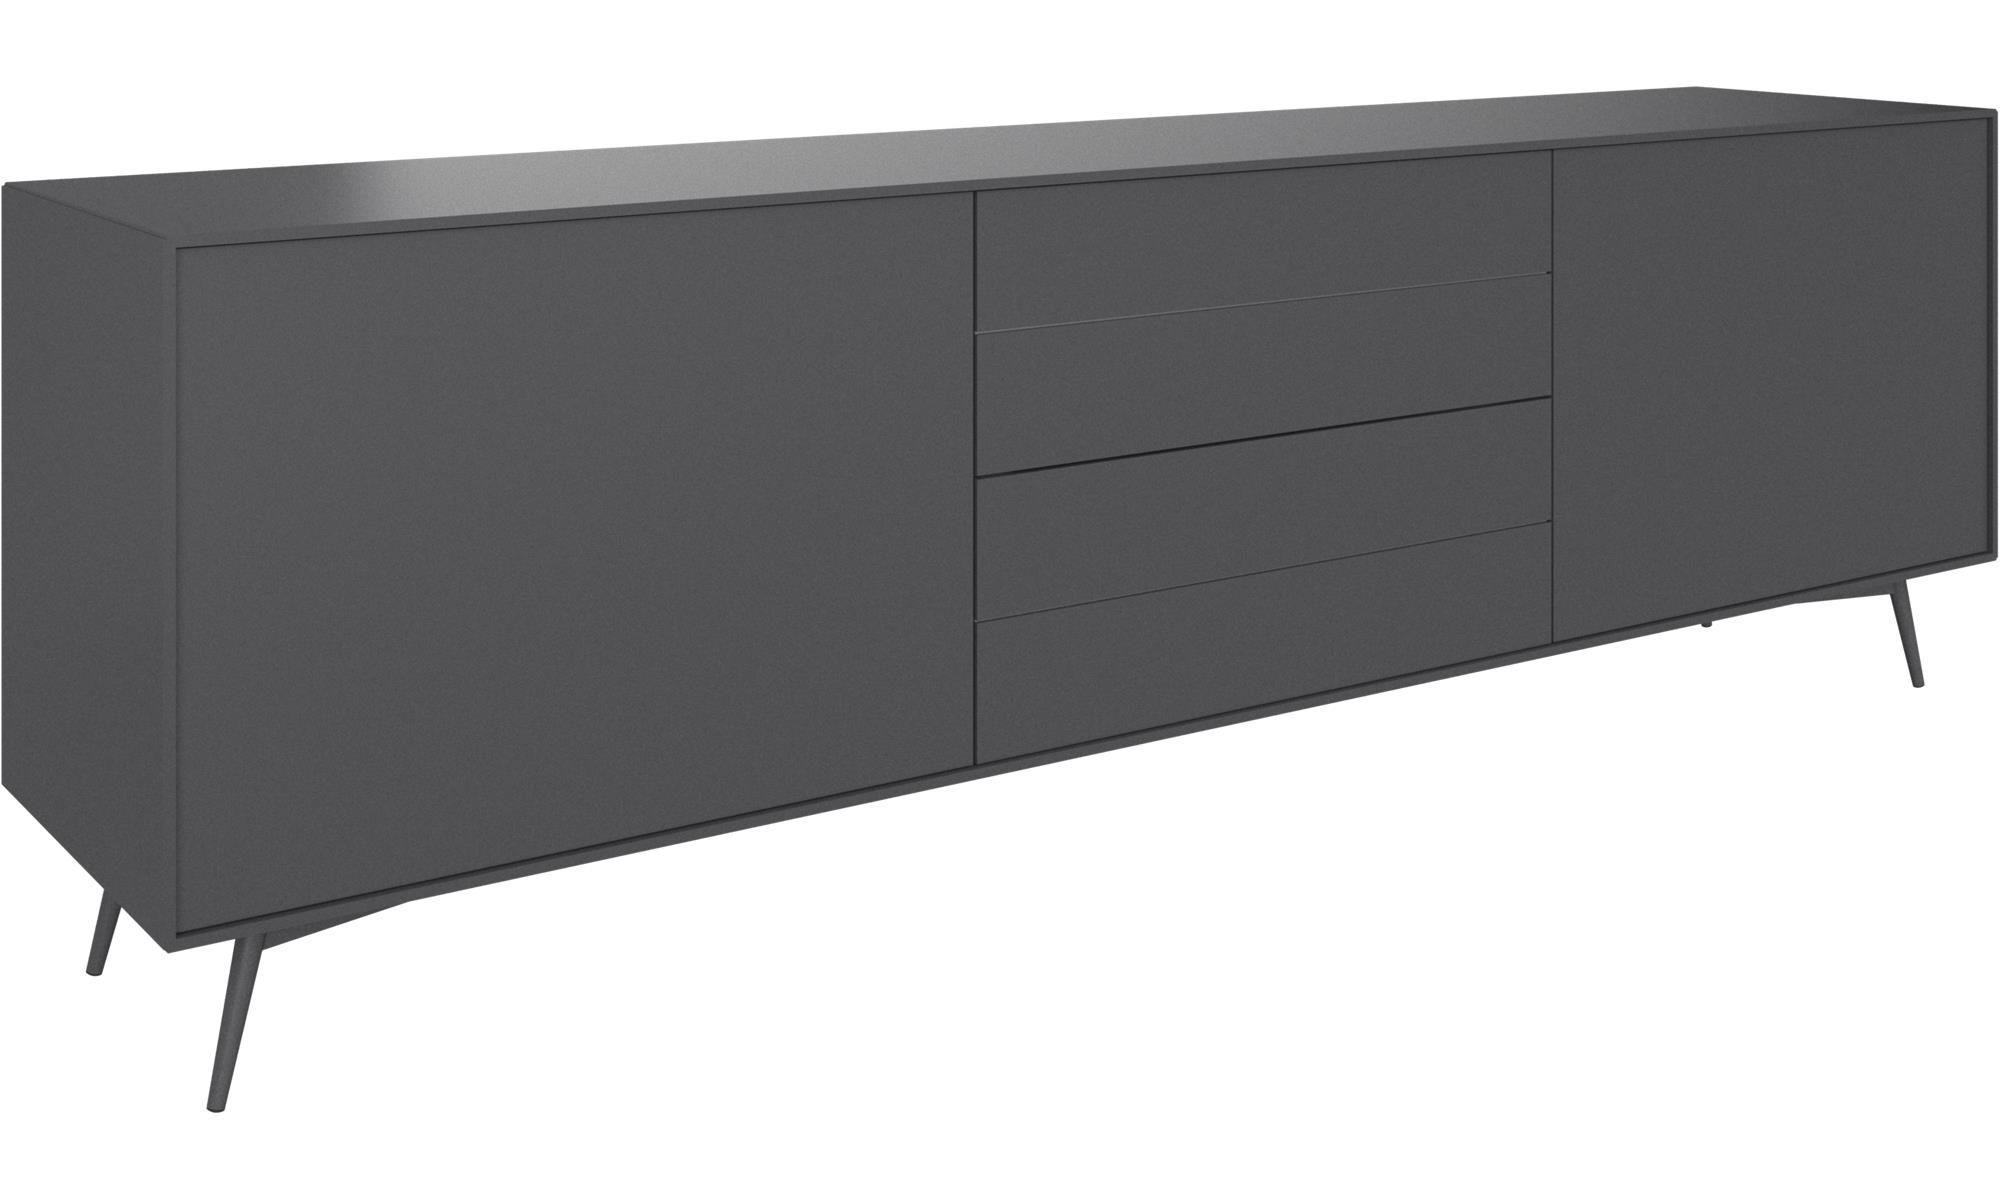 Sideboards Fermo Sideboard Sideboard Contemporary Sideboard